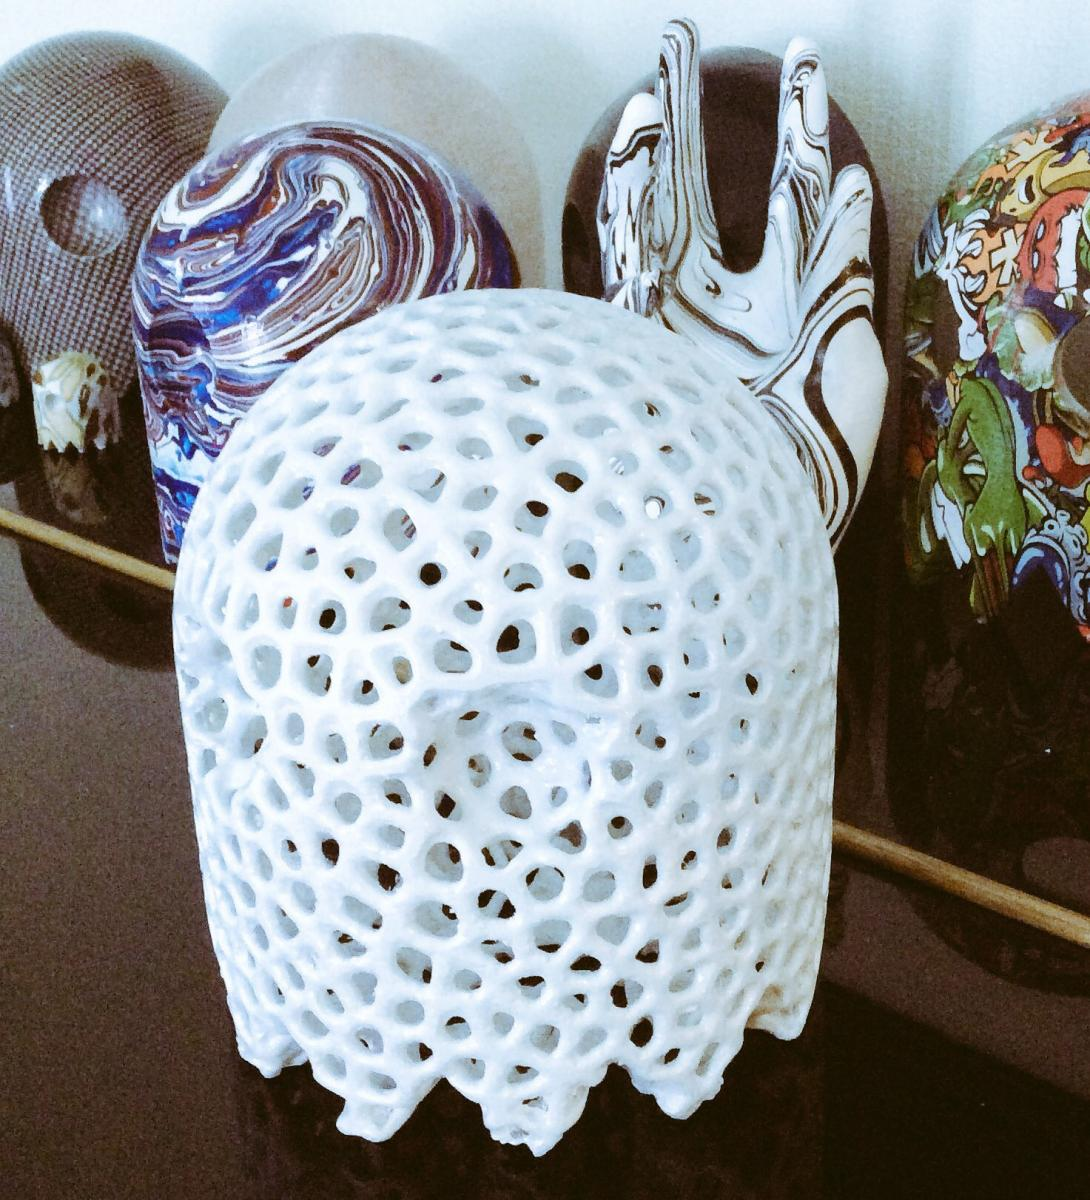 Voronoi.jpeg